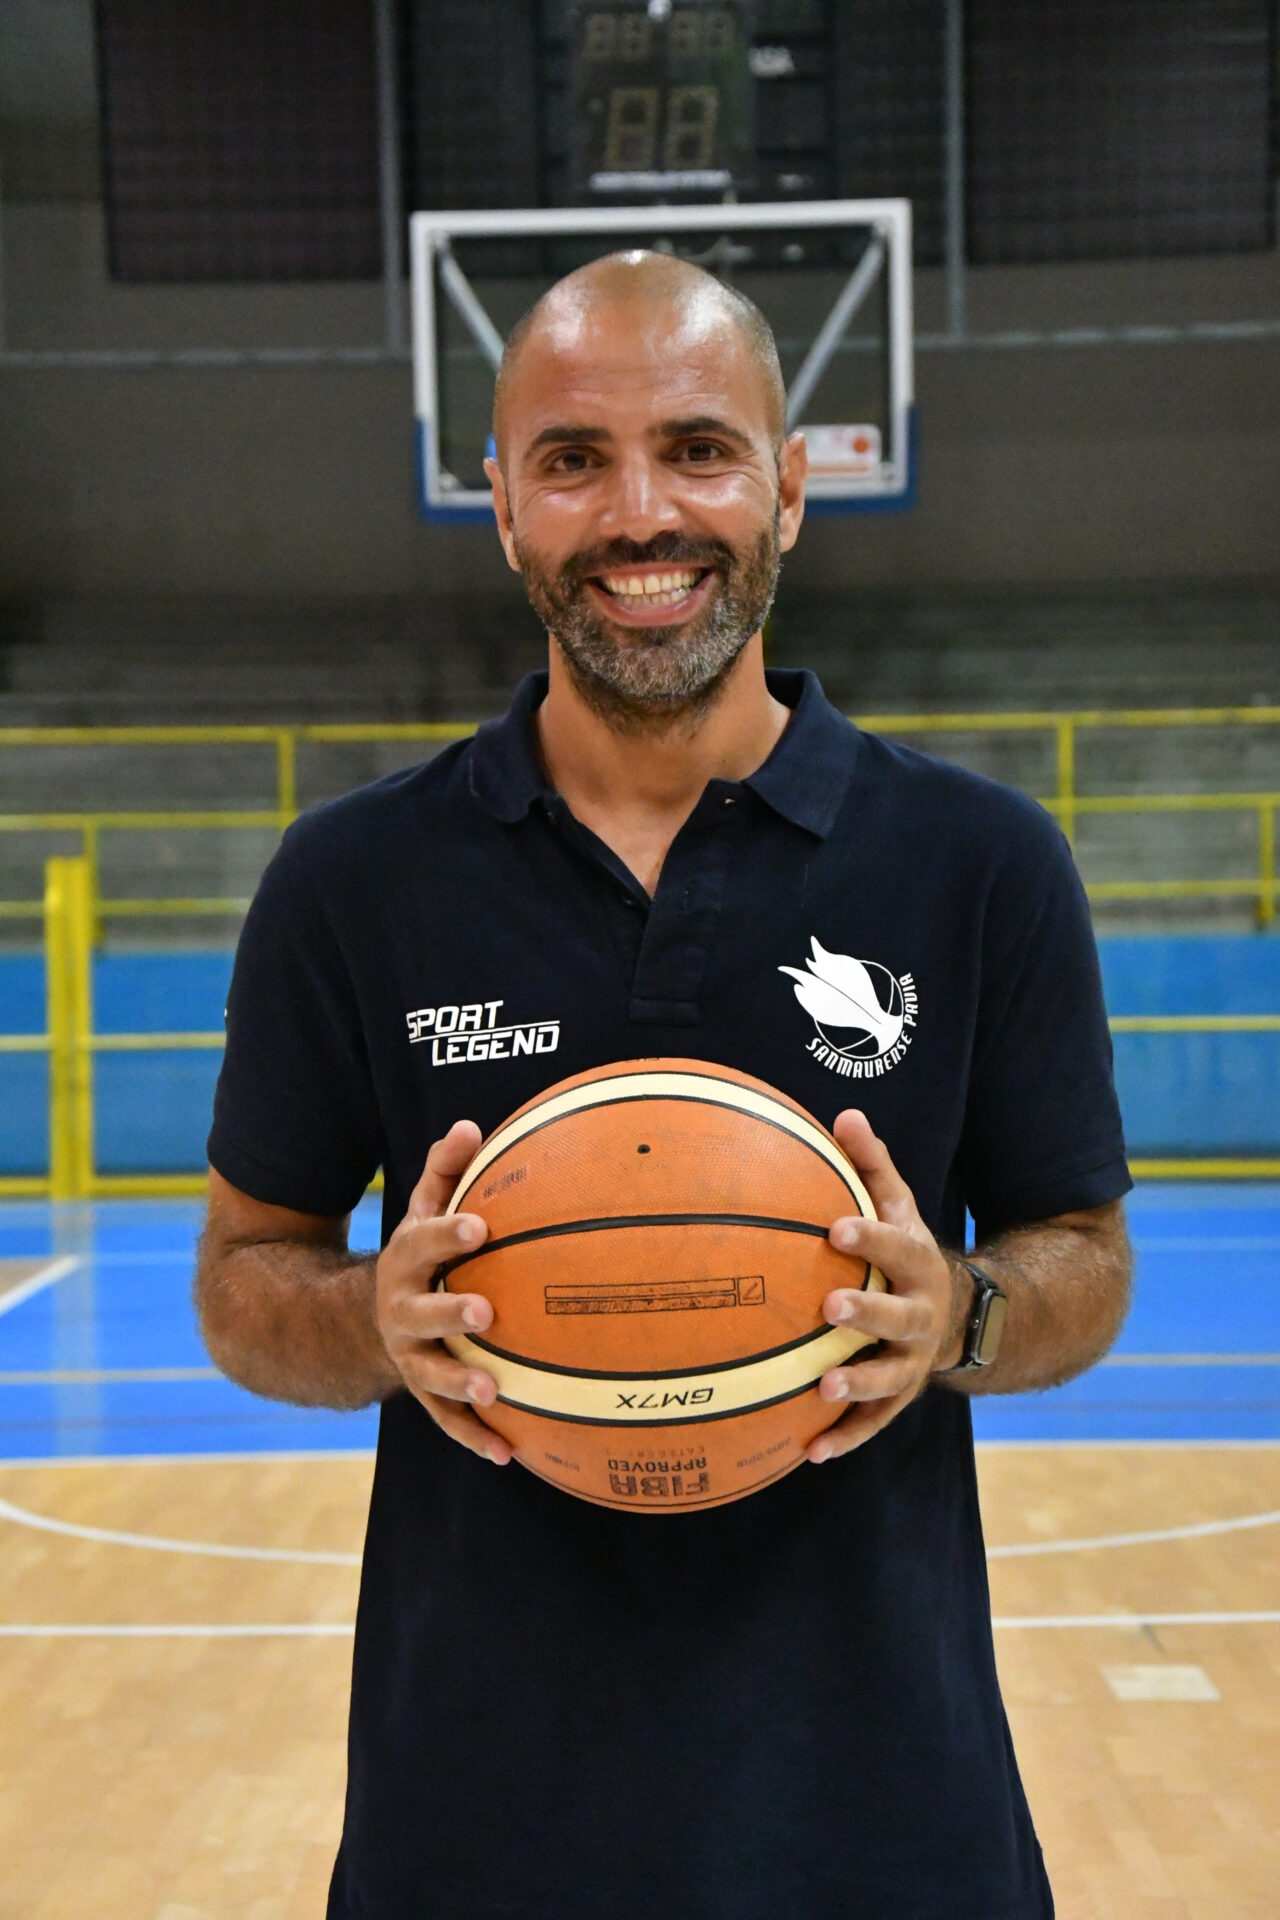 https://www.sanmaurense.it/basket/wp-content/uploads/2021/01/Roberto-Fossati-1280x1920.jpg